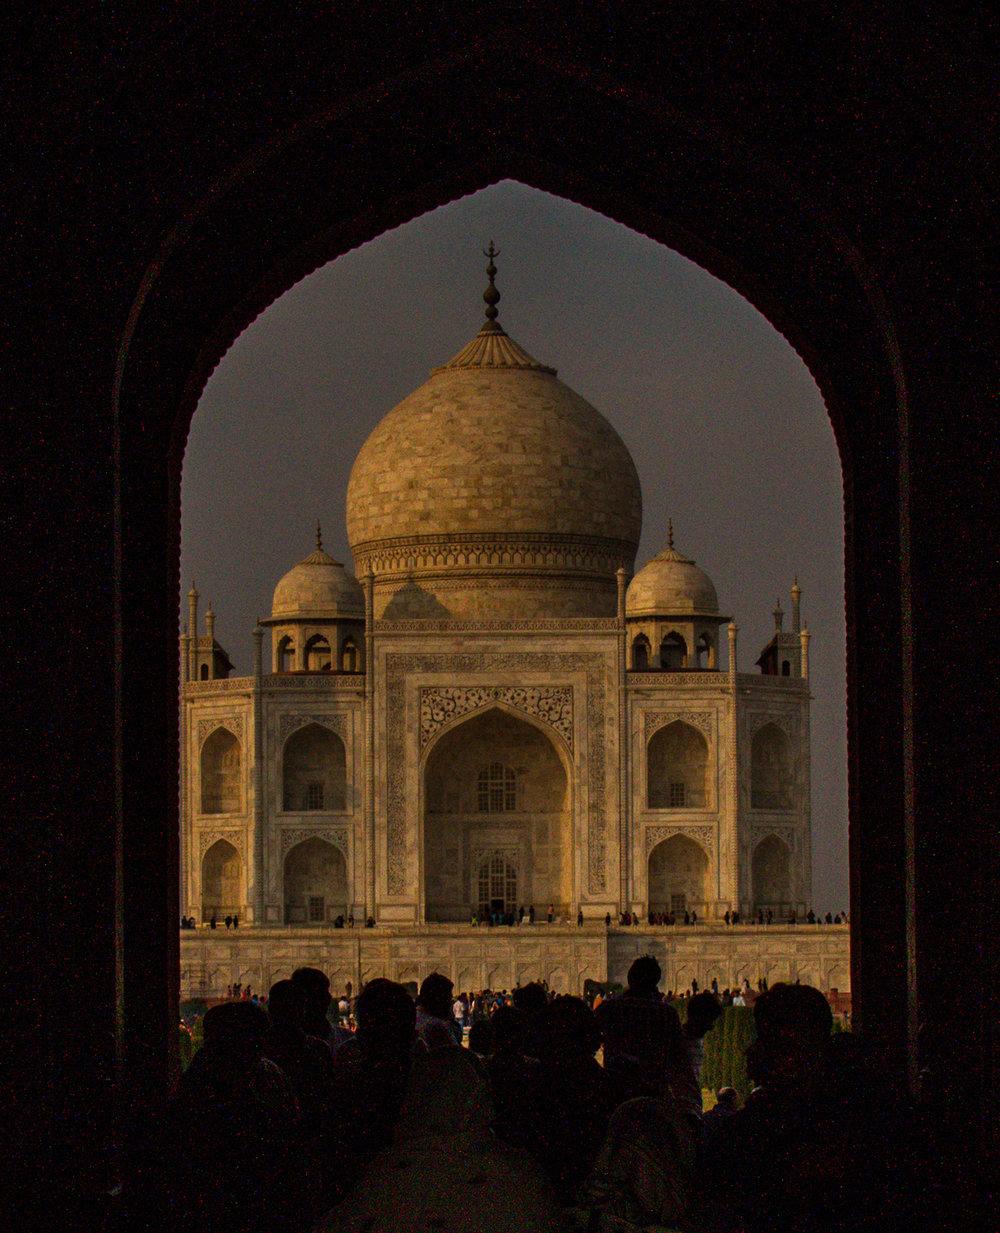 Entrance to the Taj Mahal near sunset.